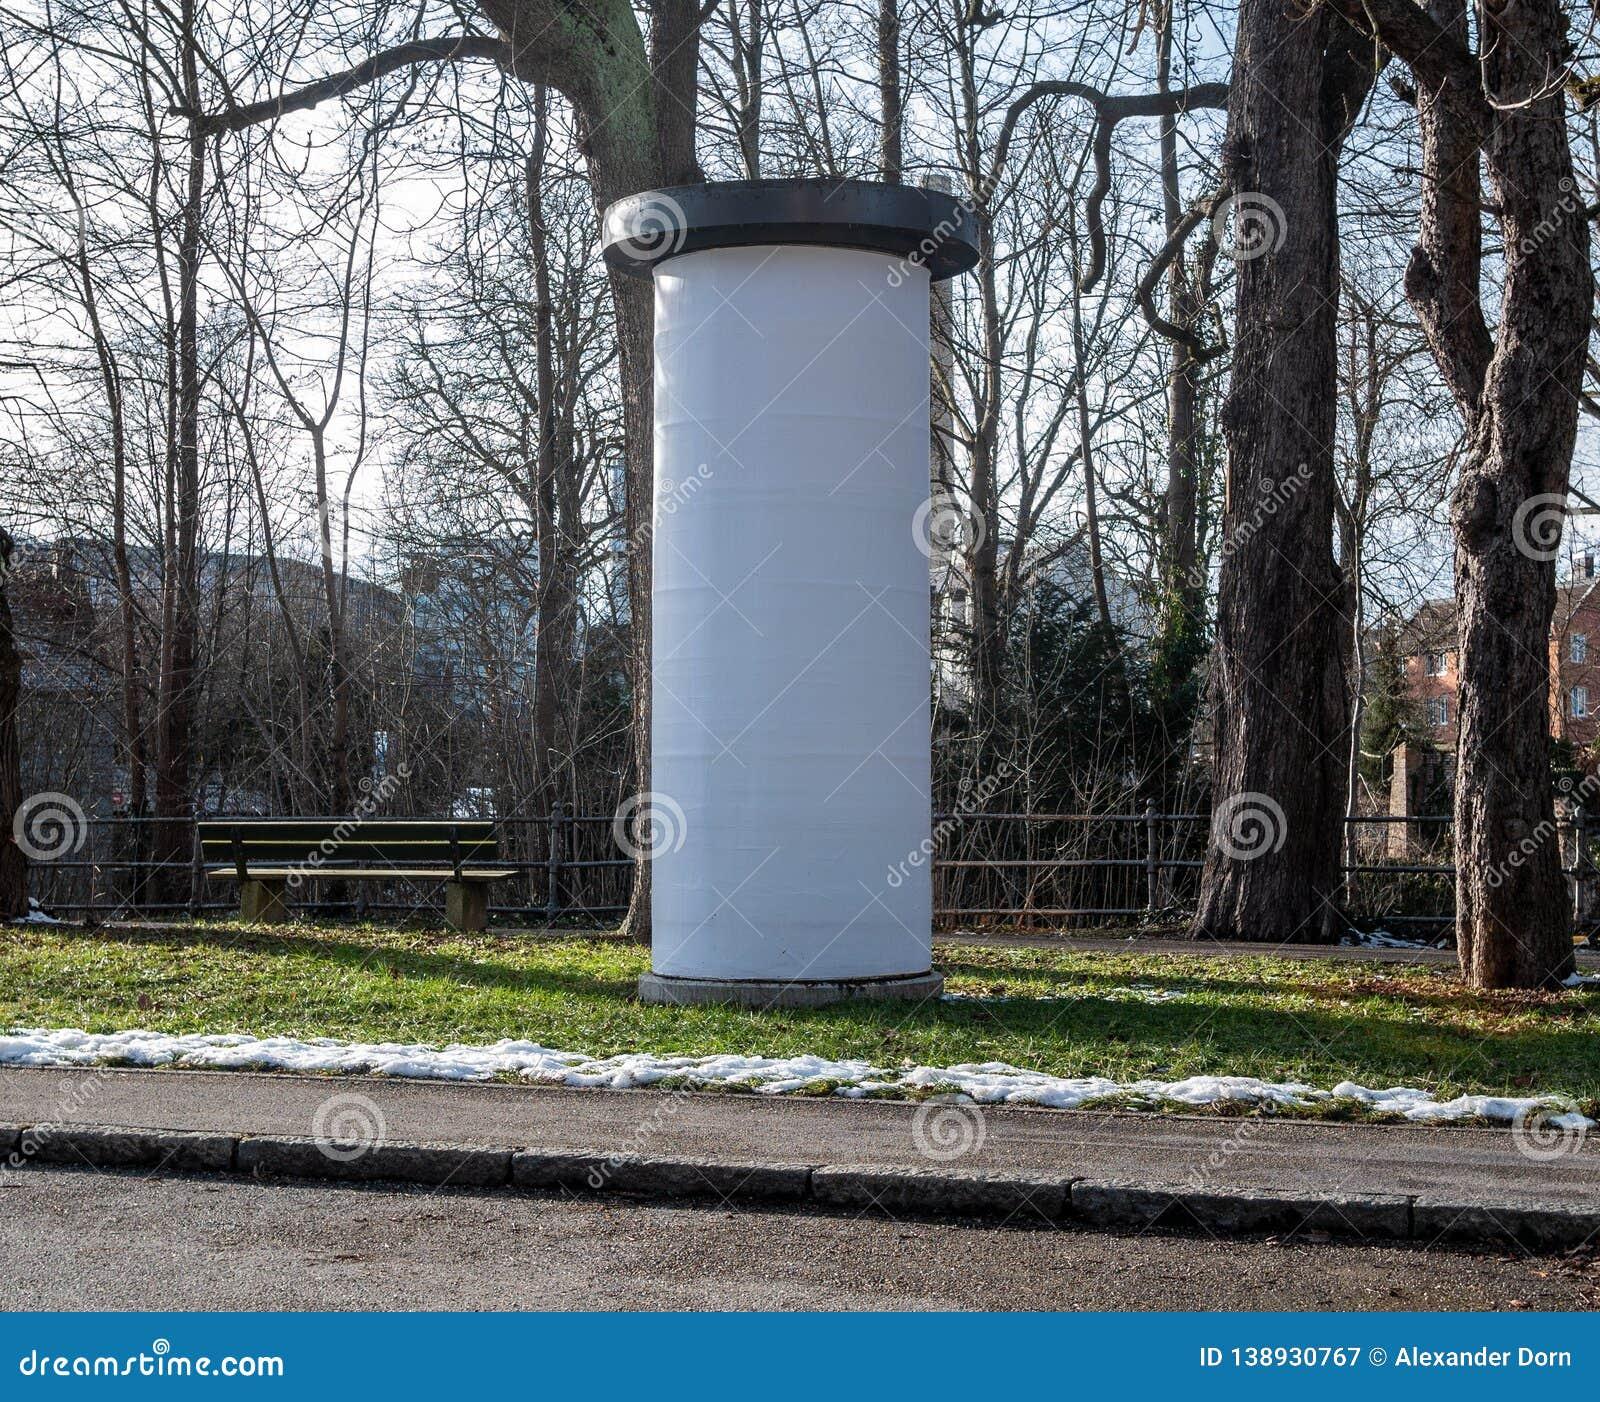 Image of Photo blank white mockup poster of street advertising column stand on sidewalk